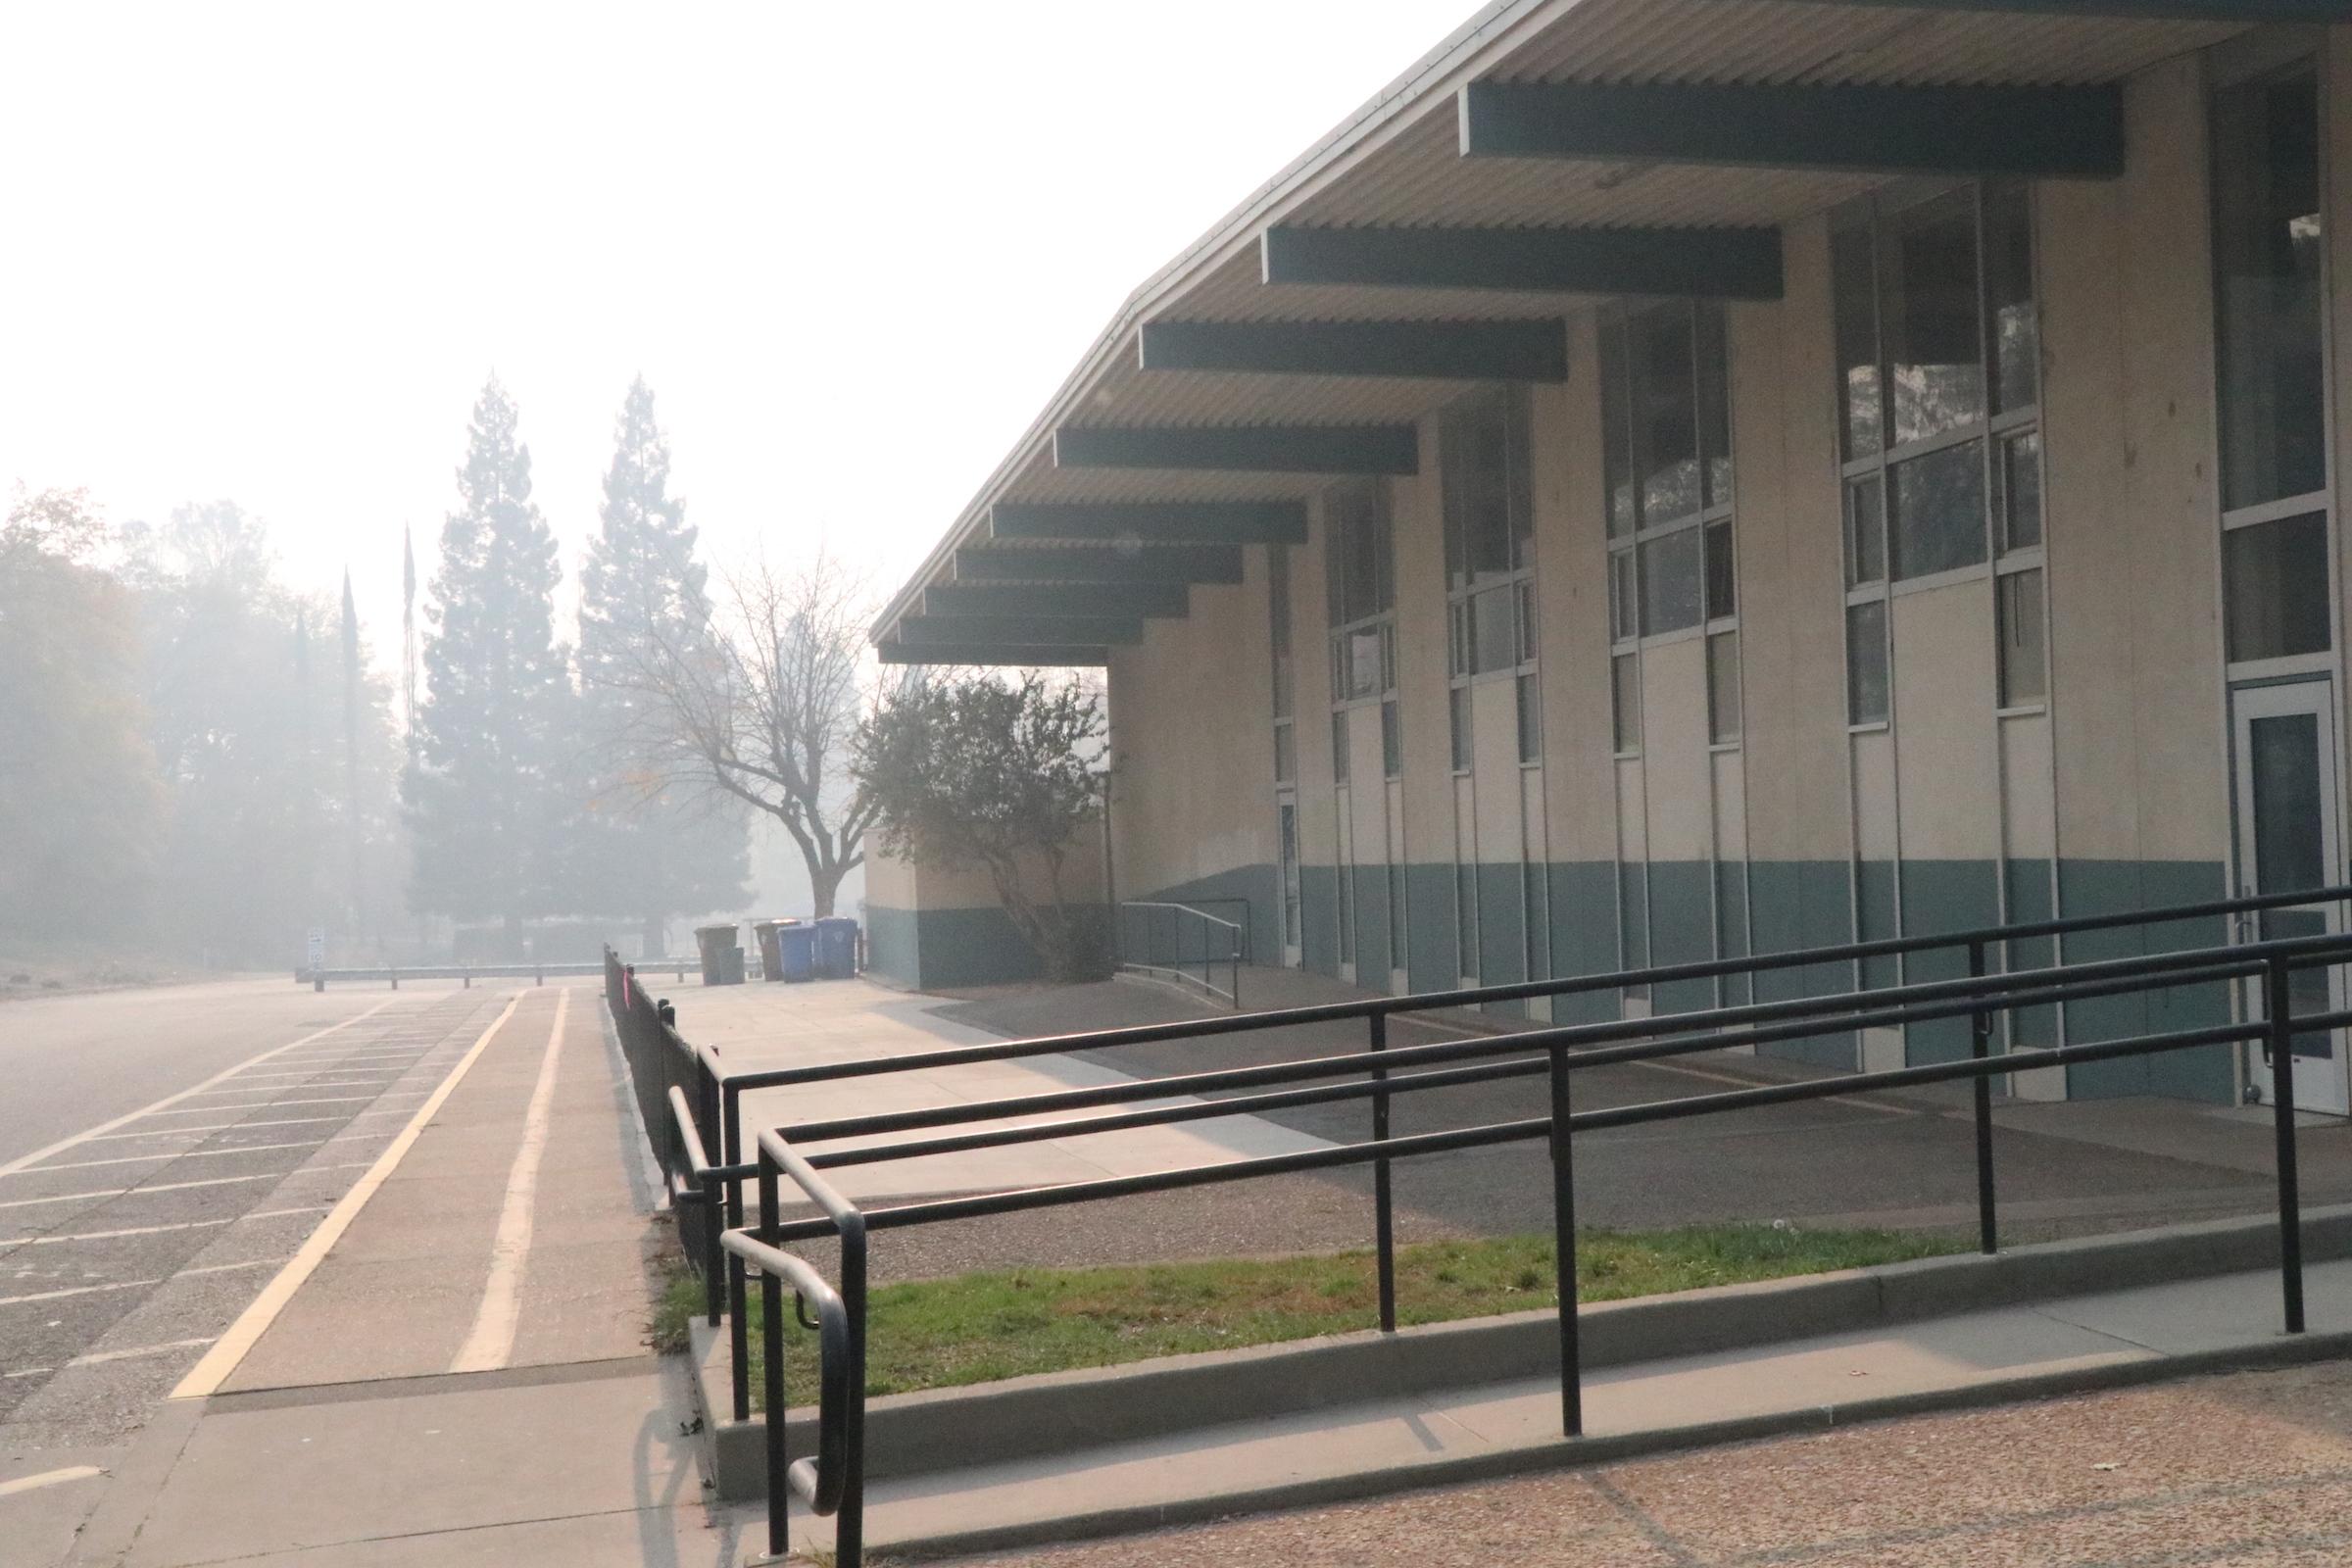 Just across the street, Paradise Intermediate School still stands, untouched by flames.  Ashlyn Rollins/Peninsula Press